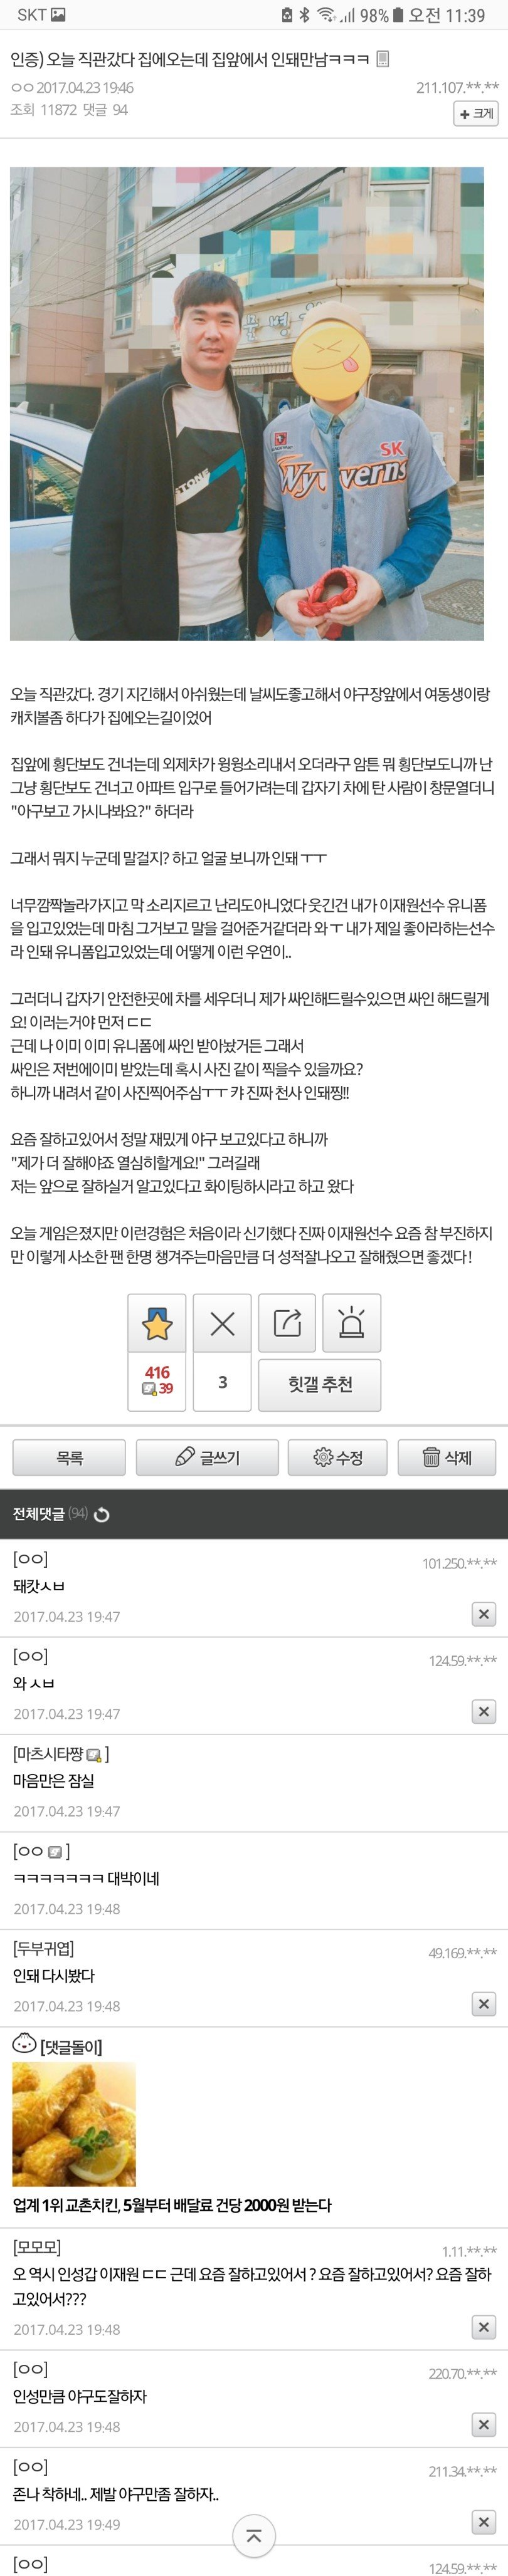 viewimage.php?no=24b0d769e1d32ca73dec8ffa11d02831046ced35d9c2bd23e7054f3c2d8967a87ef7a837785aa56ddce750c0256d26d923c436ad1da6d82ea27370e9904d8ce23cb5ed5e330431e62ba82b81d69de4ce20f4a87cf1903fd7829e63343d0c006223